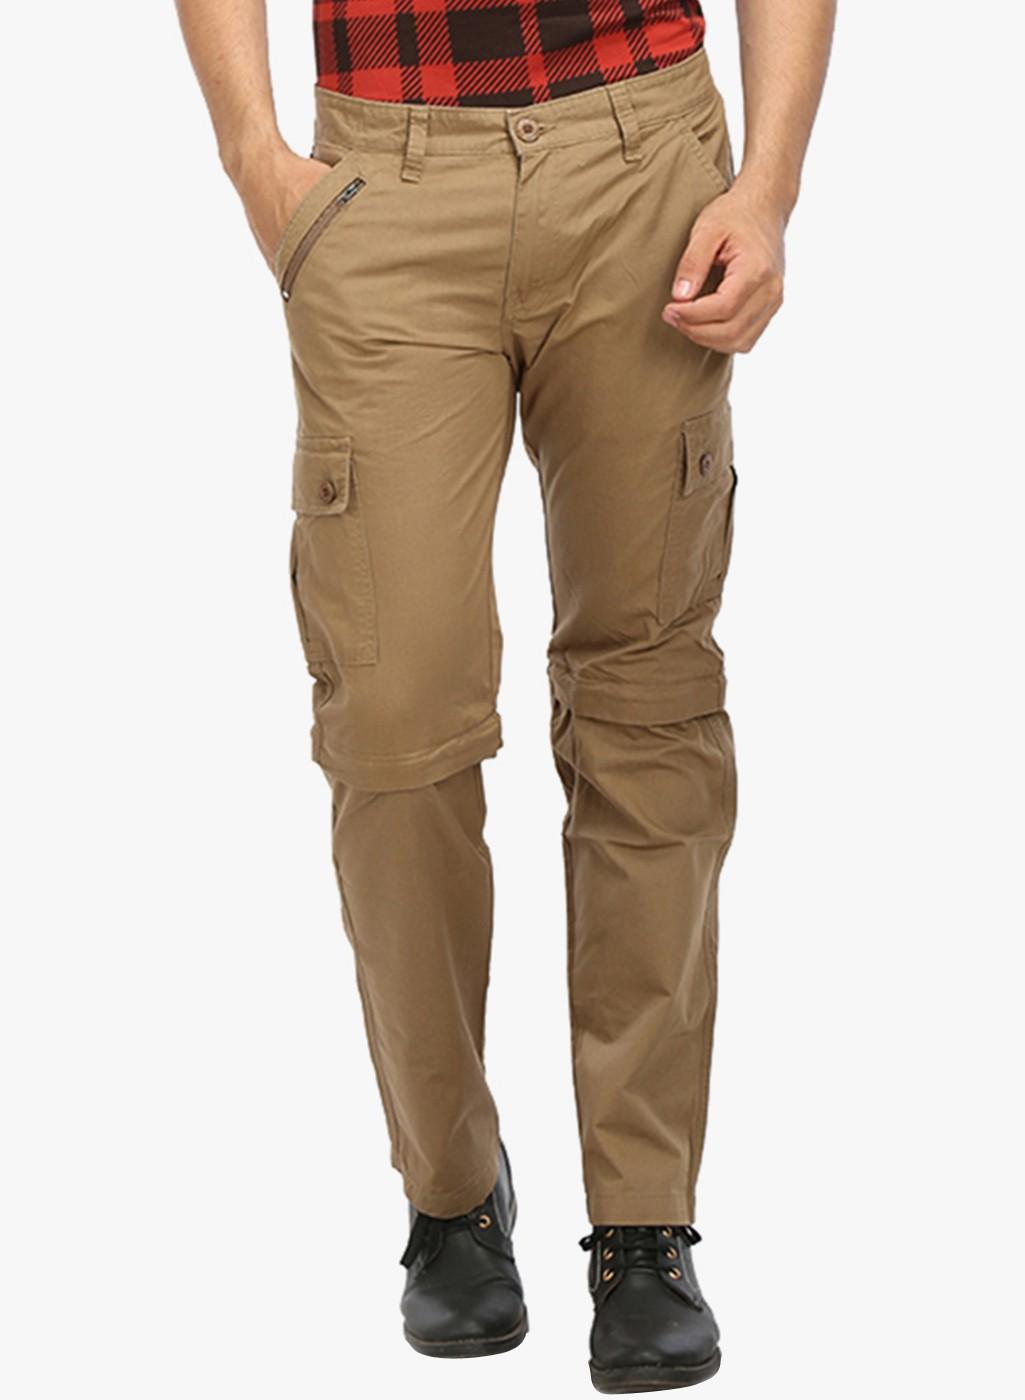 Khaki Solid Slim Fit Cotton Cargo